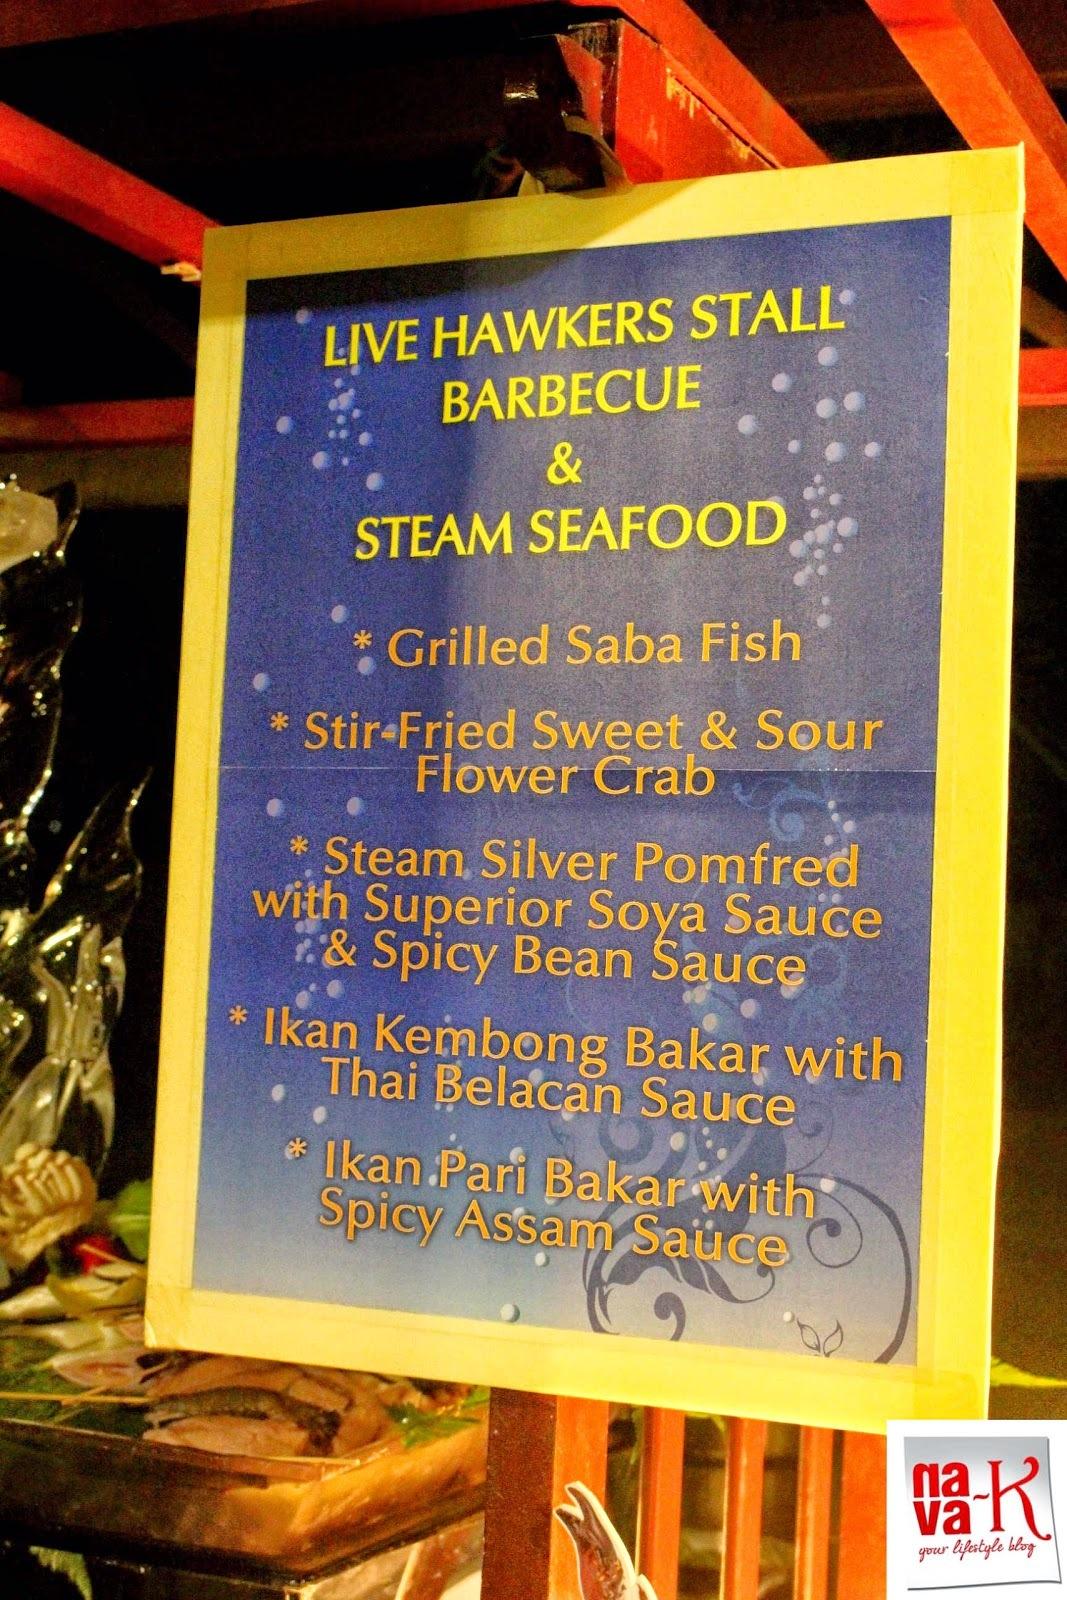 Dorsett Grand Subang - Seafood Promotion: Neptune's Kingdom @ Terraza Brasserie